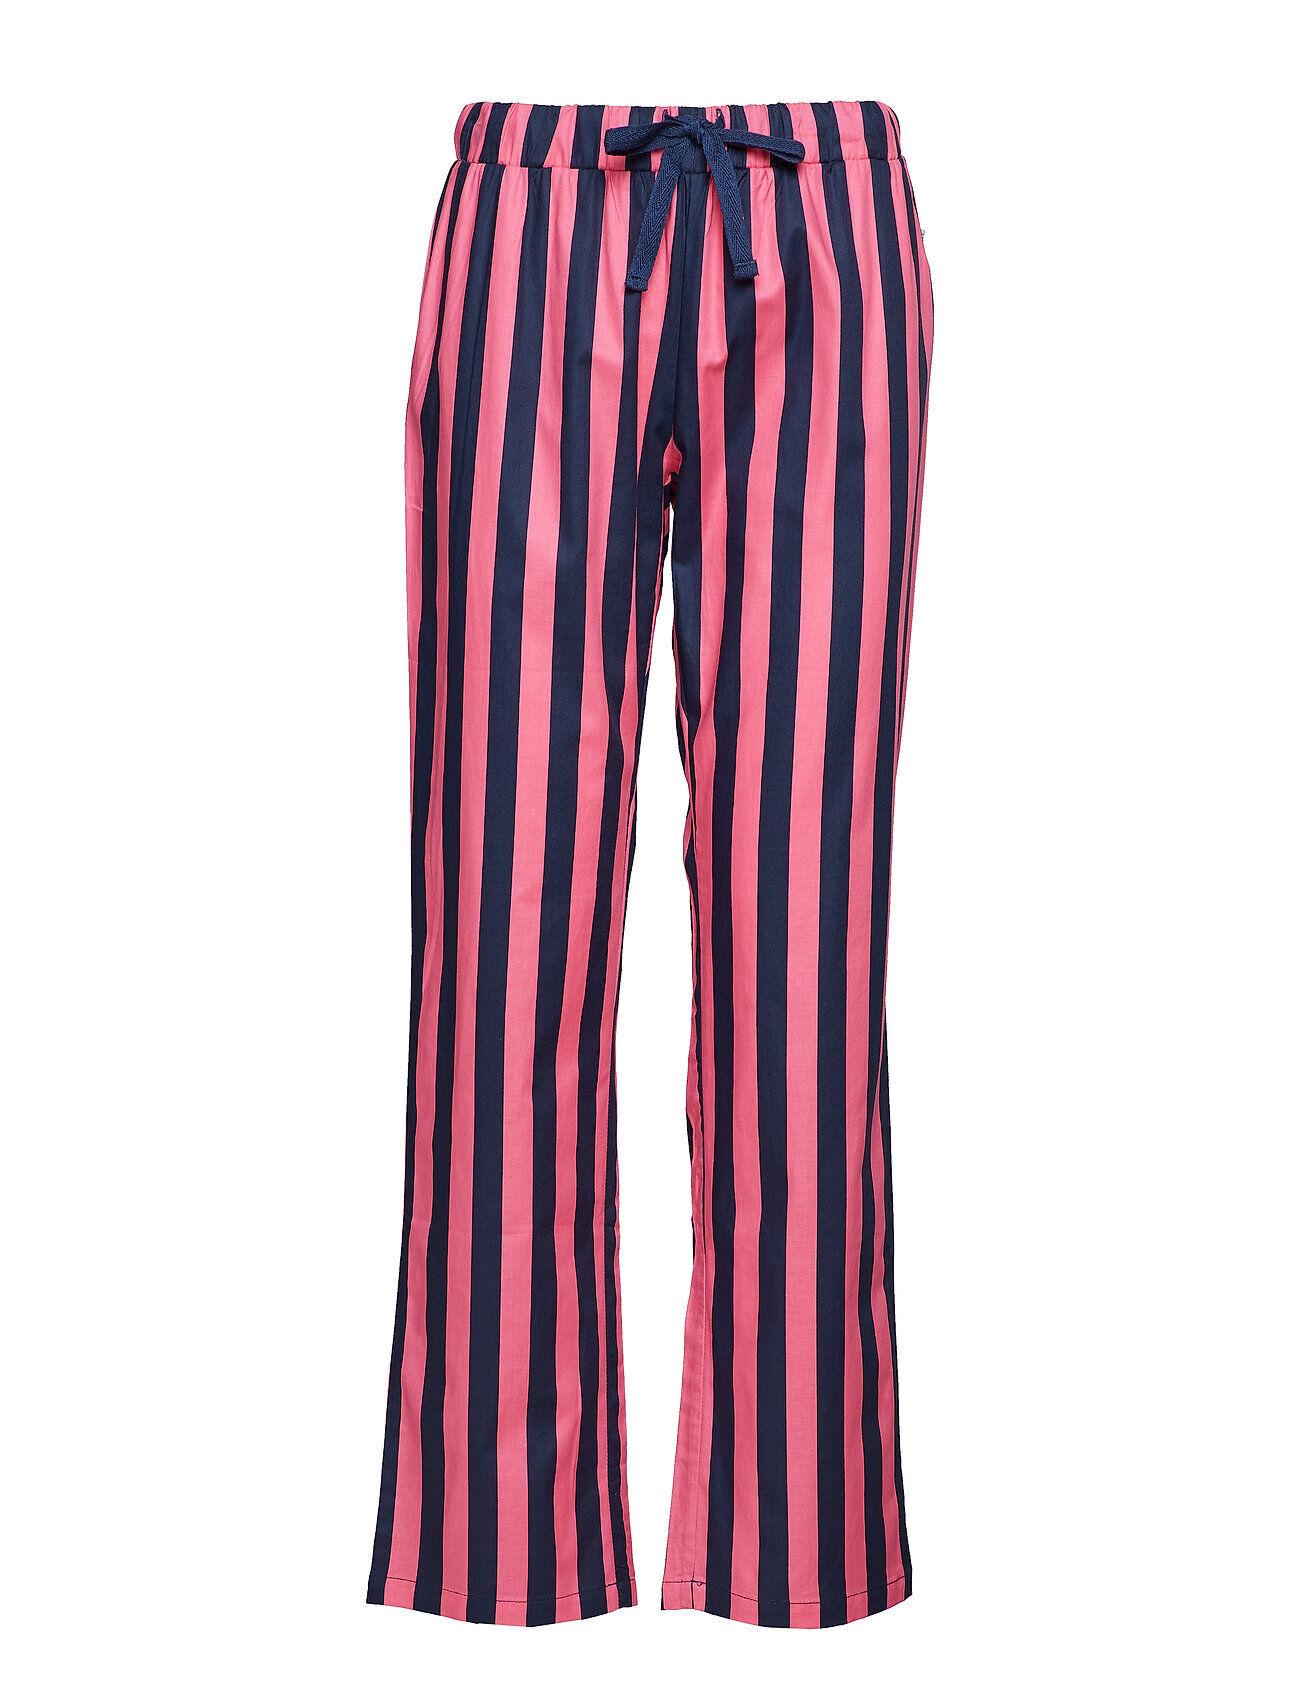 Rayville Chrissie Pj Pant Line Stripe